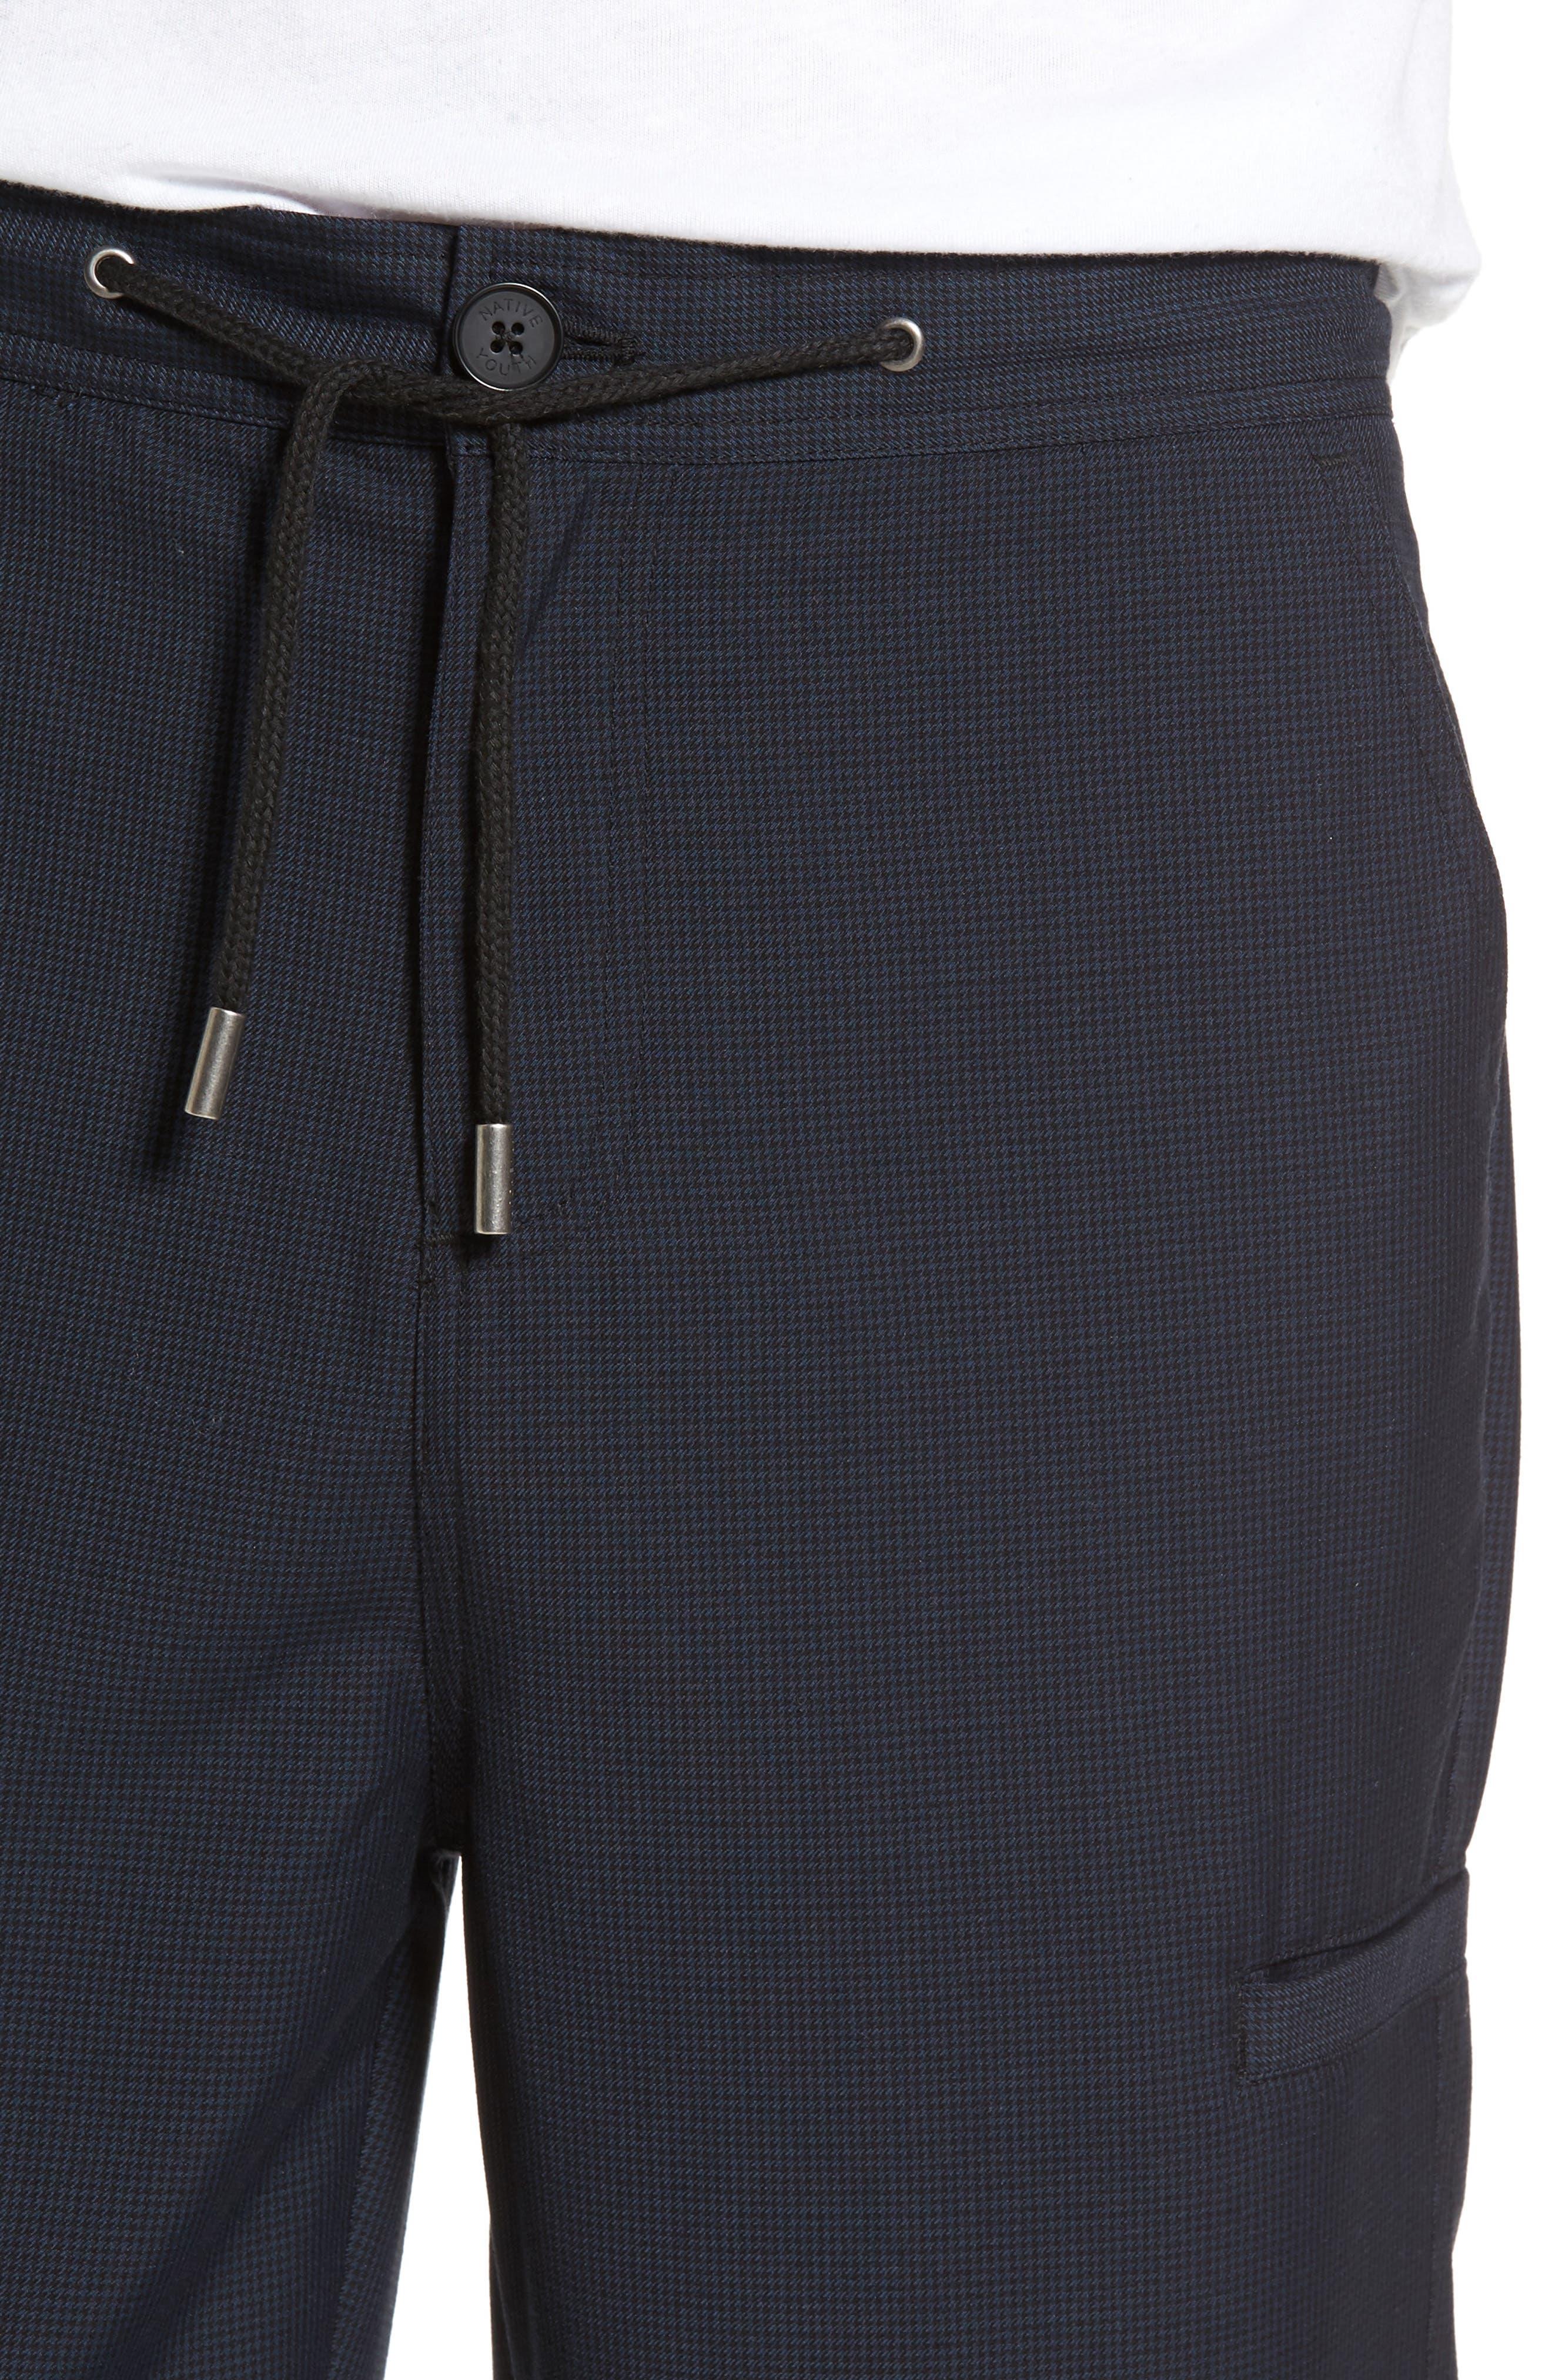 Haycroft Trousers,                             Alternate thumbnail 4, color,                             Navy